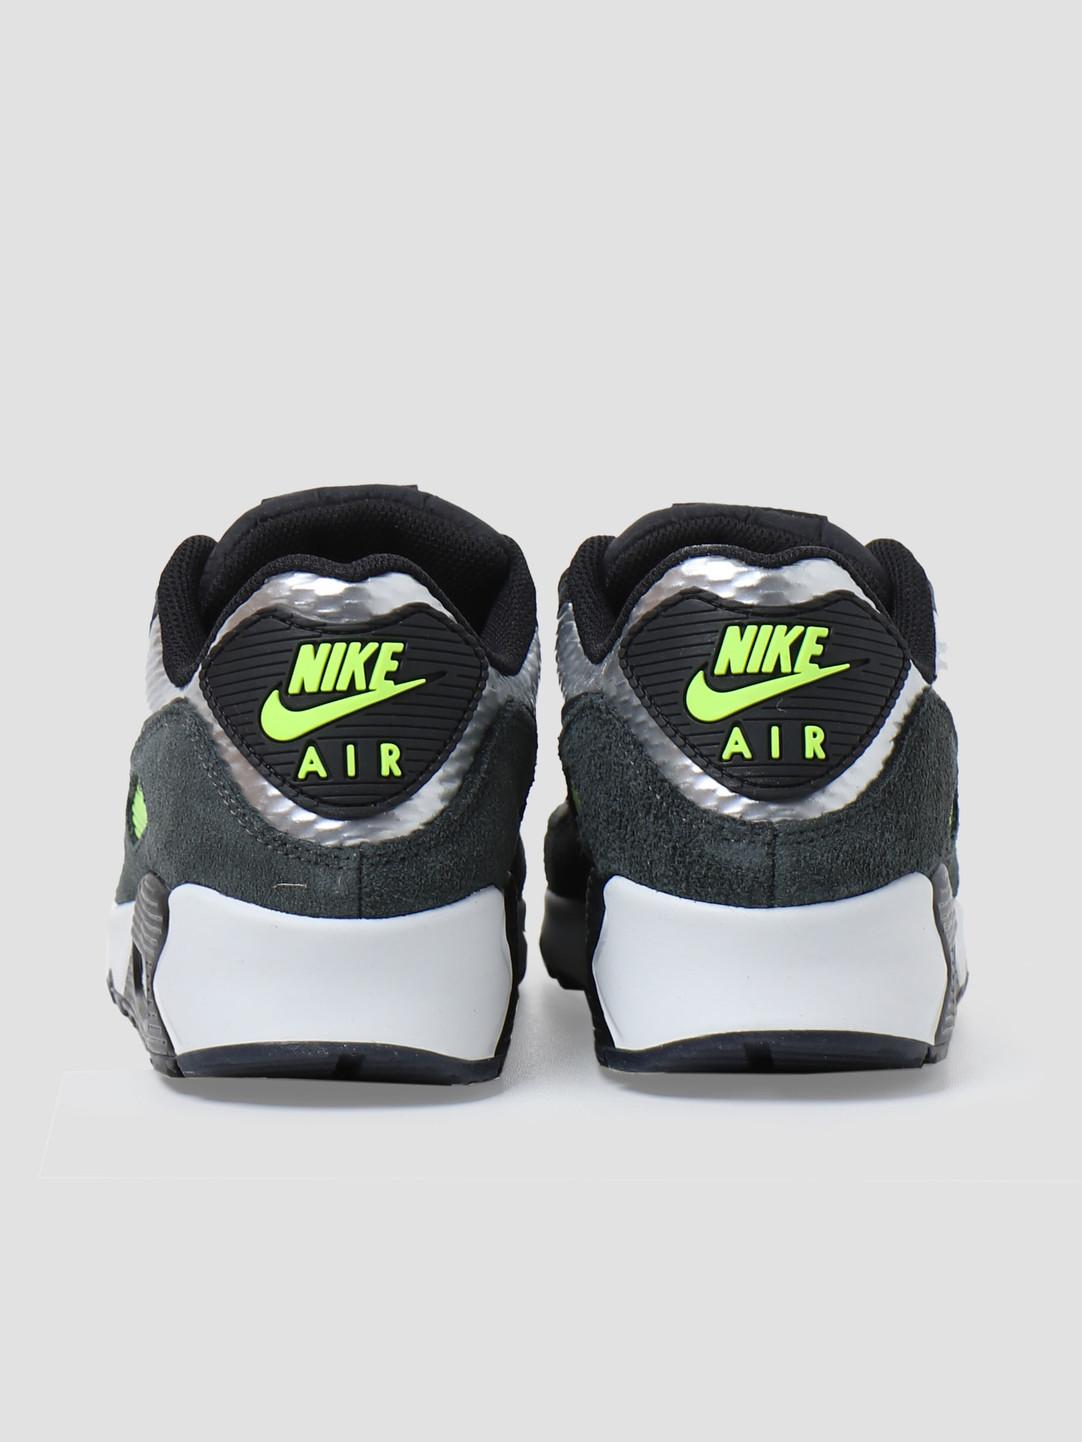 Nike Nike Air Max 90 3M Anthracite Anthracite Volt Black CZ2975-002